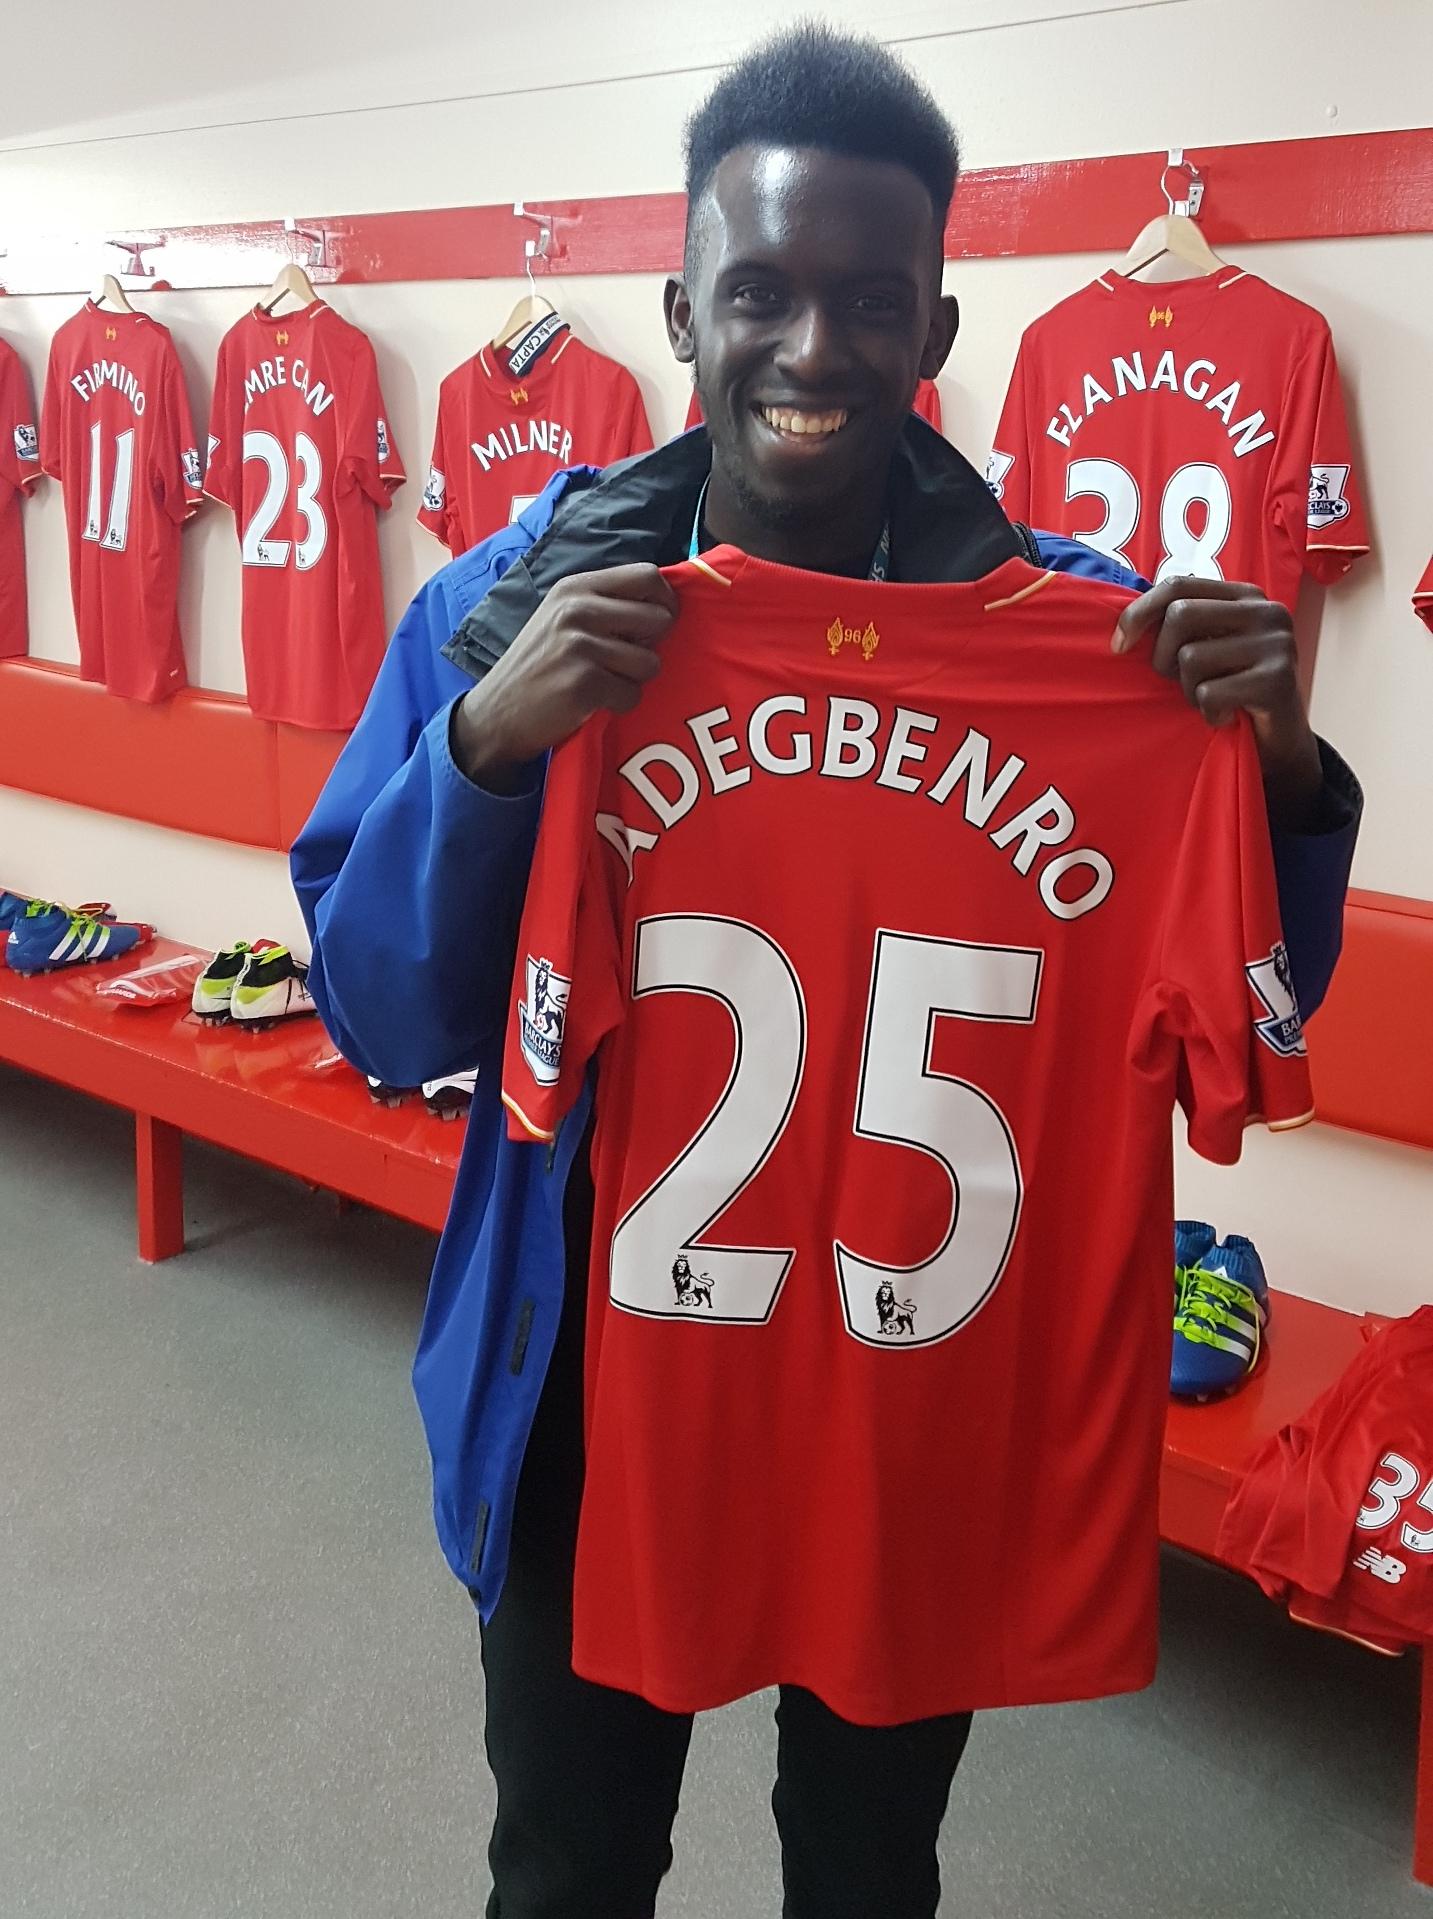 Emini holding up a Liverpool FC shirt